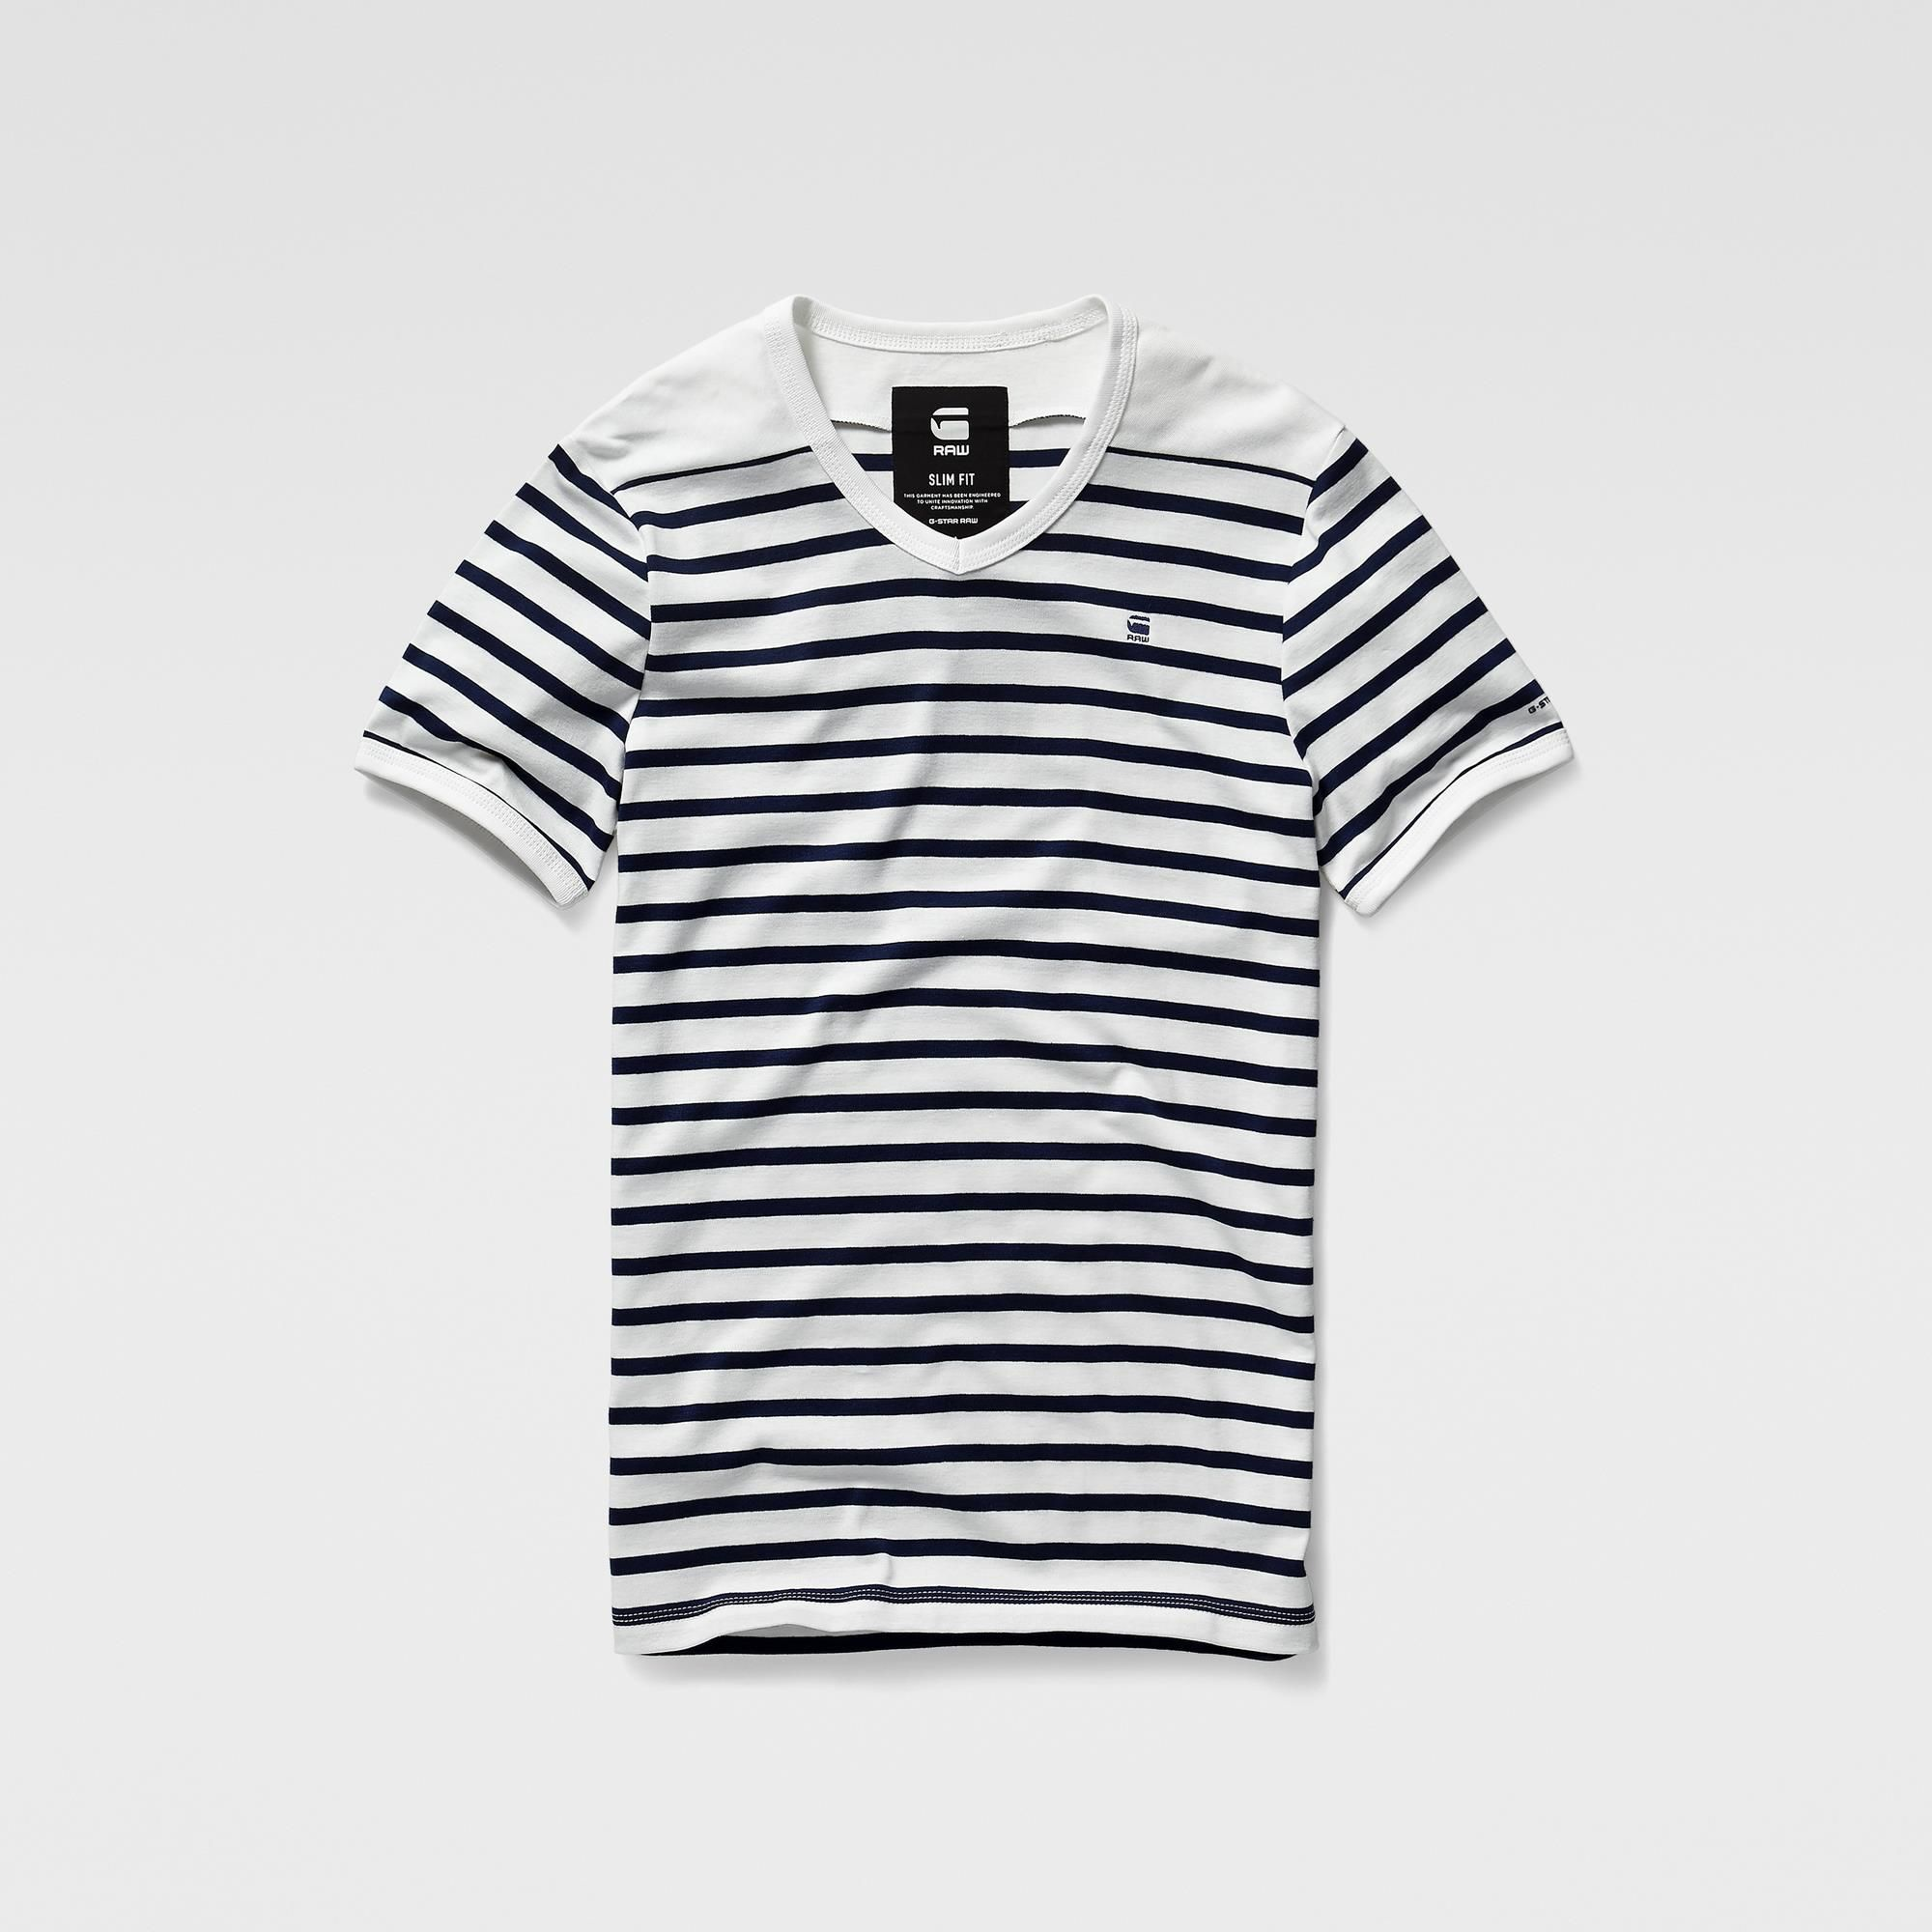 17c128f998 Ramic Stripe Short Sleeve T-shirt G Star Raw, Striped Shorts, Tee Shirts